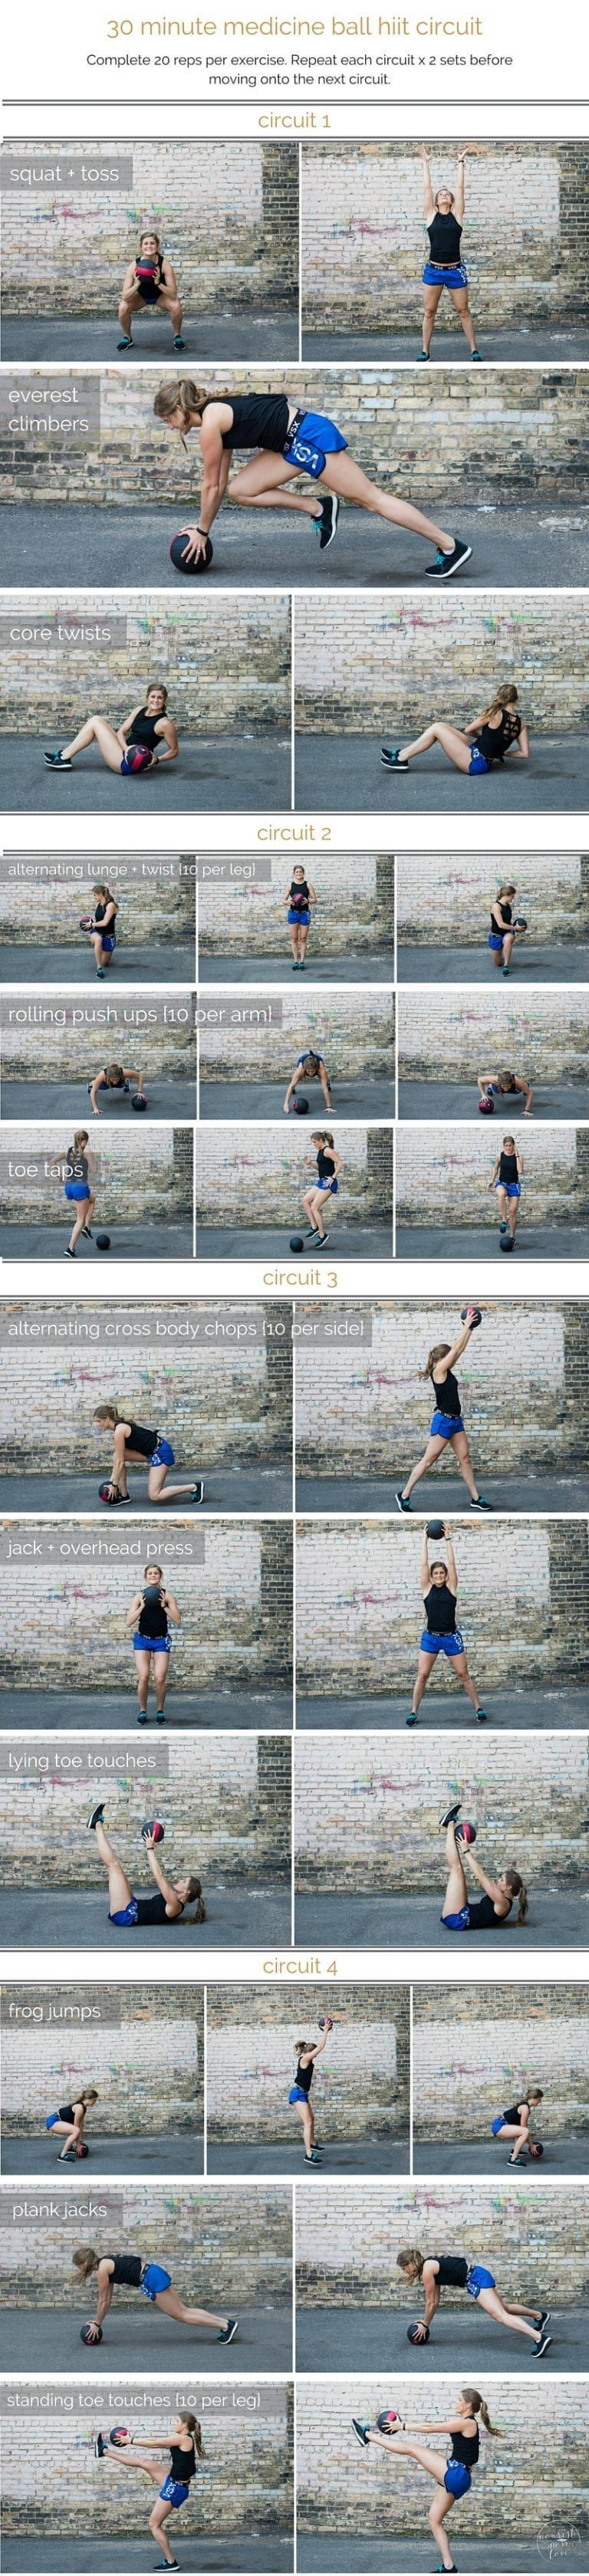 #Ball #Circuit #fitness #HIIT #langhantel #langhantel fitn  #Ball #Circuit #fitness #HIIT #langhante...